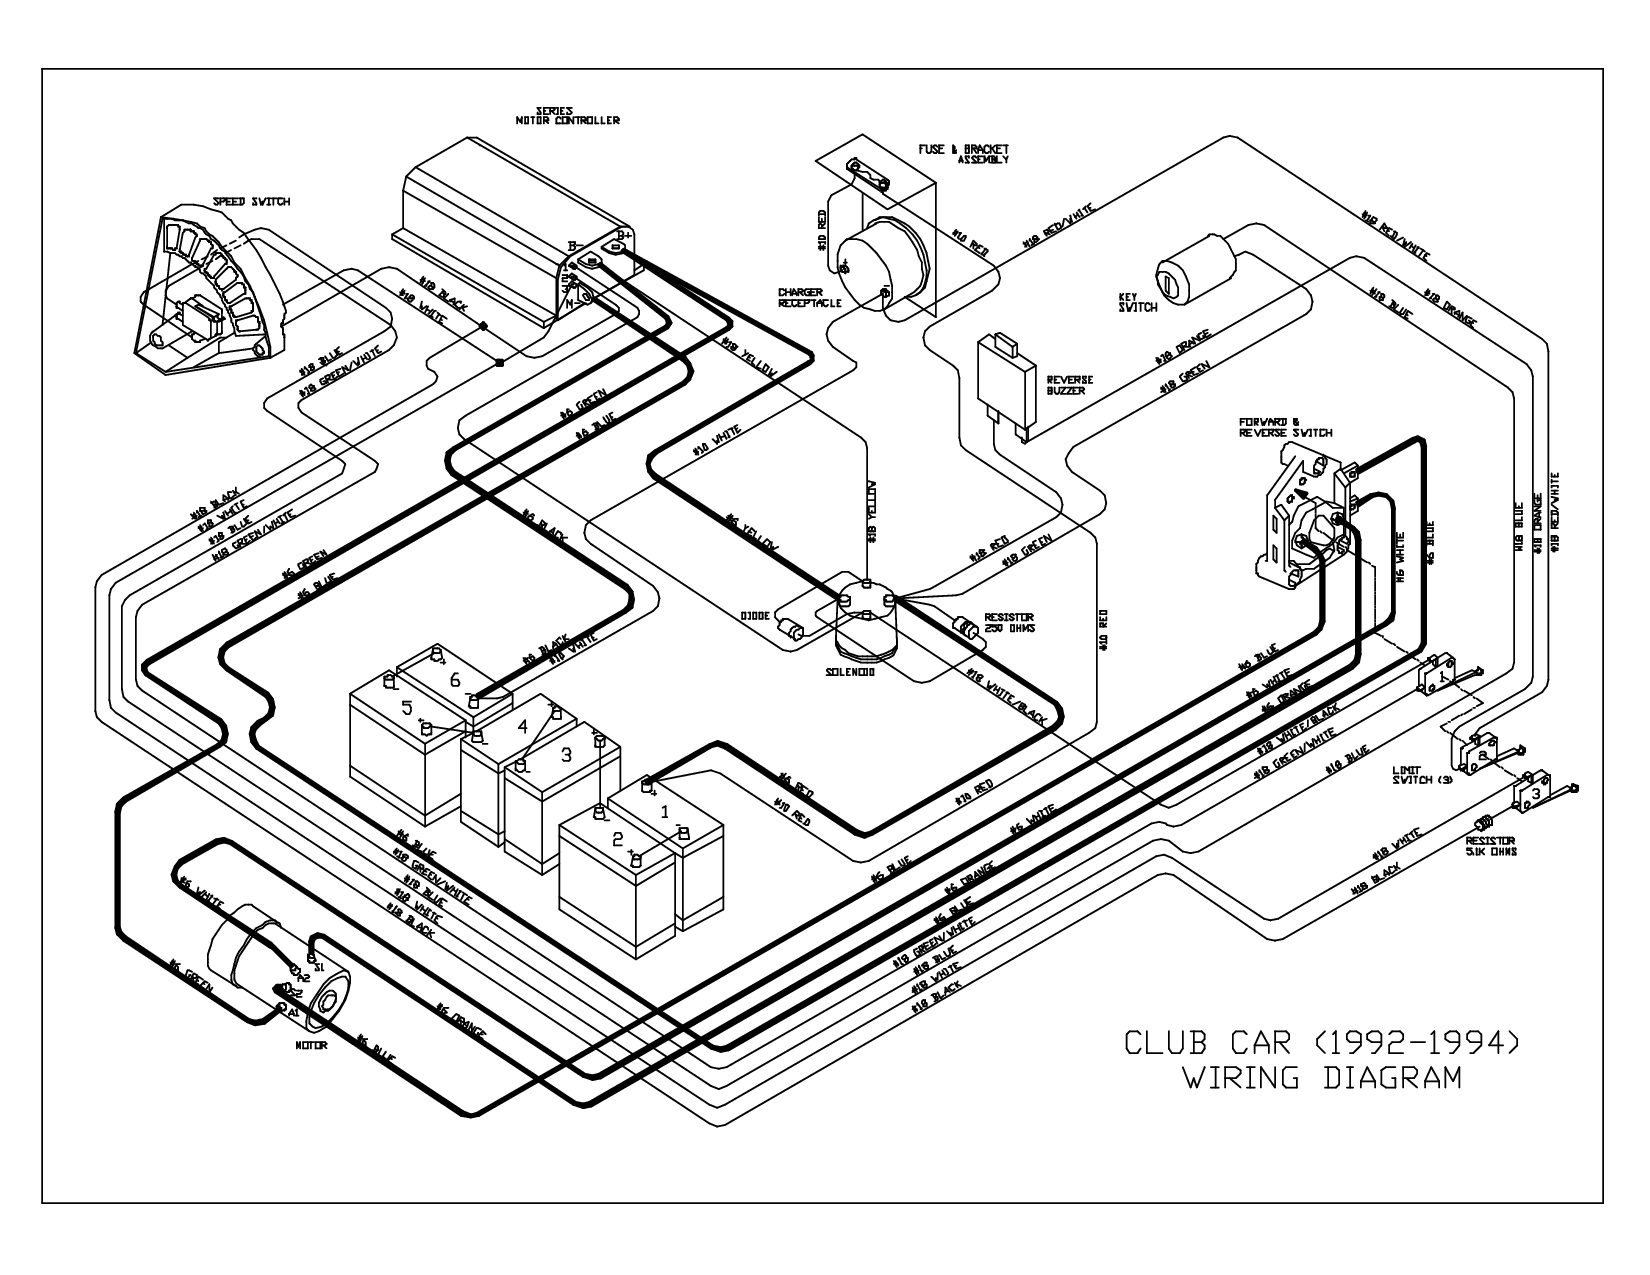 1995 club car wiring diagram club car 1992 1994 wiring diagram